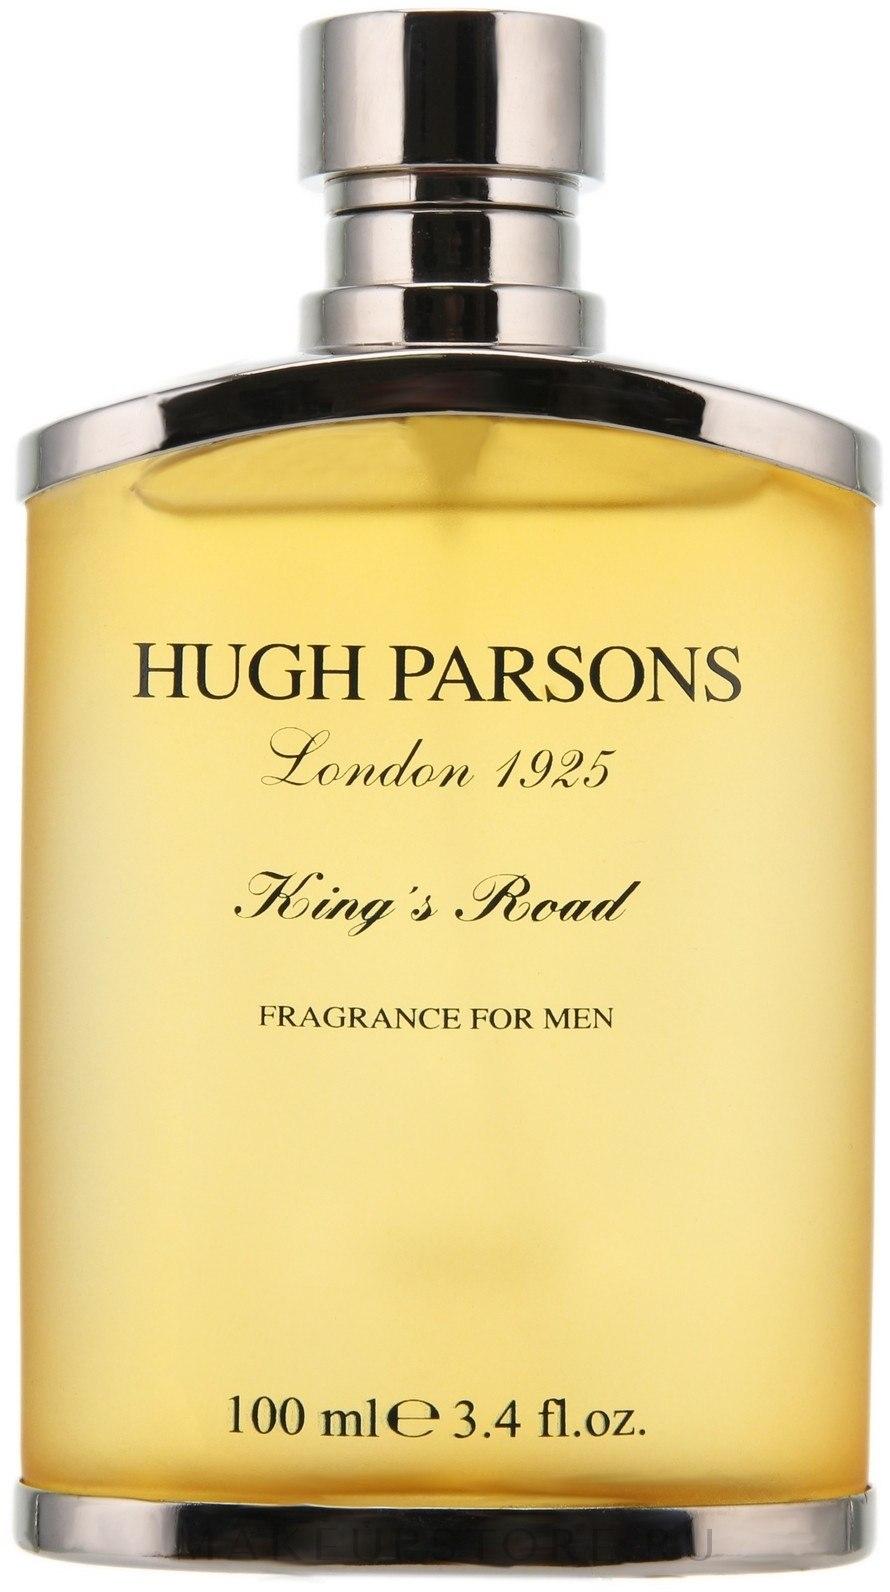 Hugh Parsons King's Road (M) edp 100ml